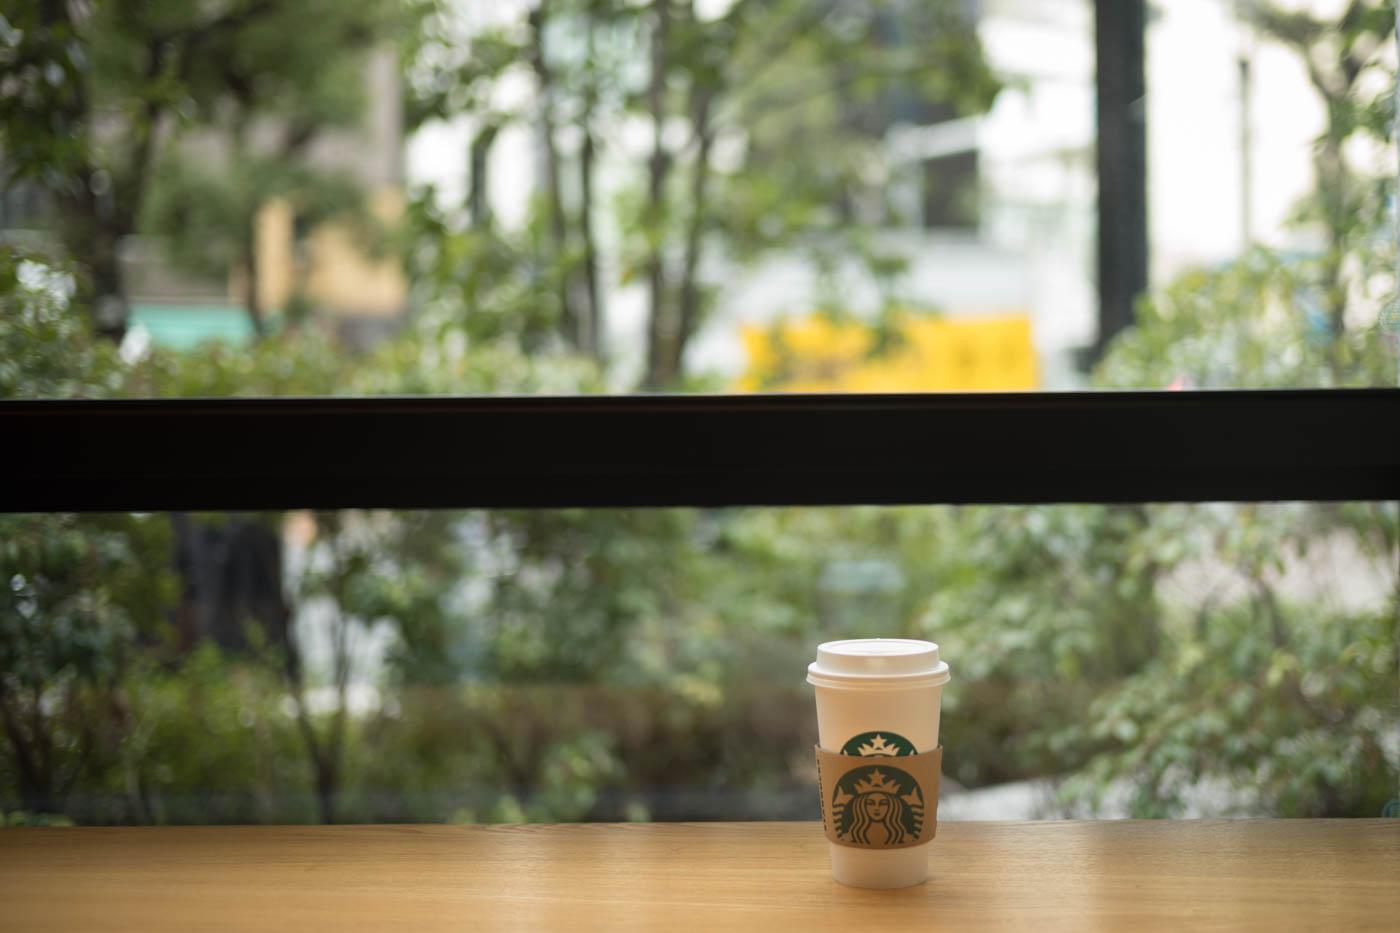 Starbucks Japan Headquarters in Meguro